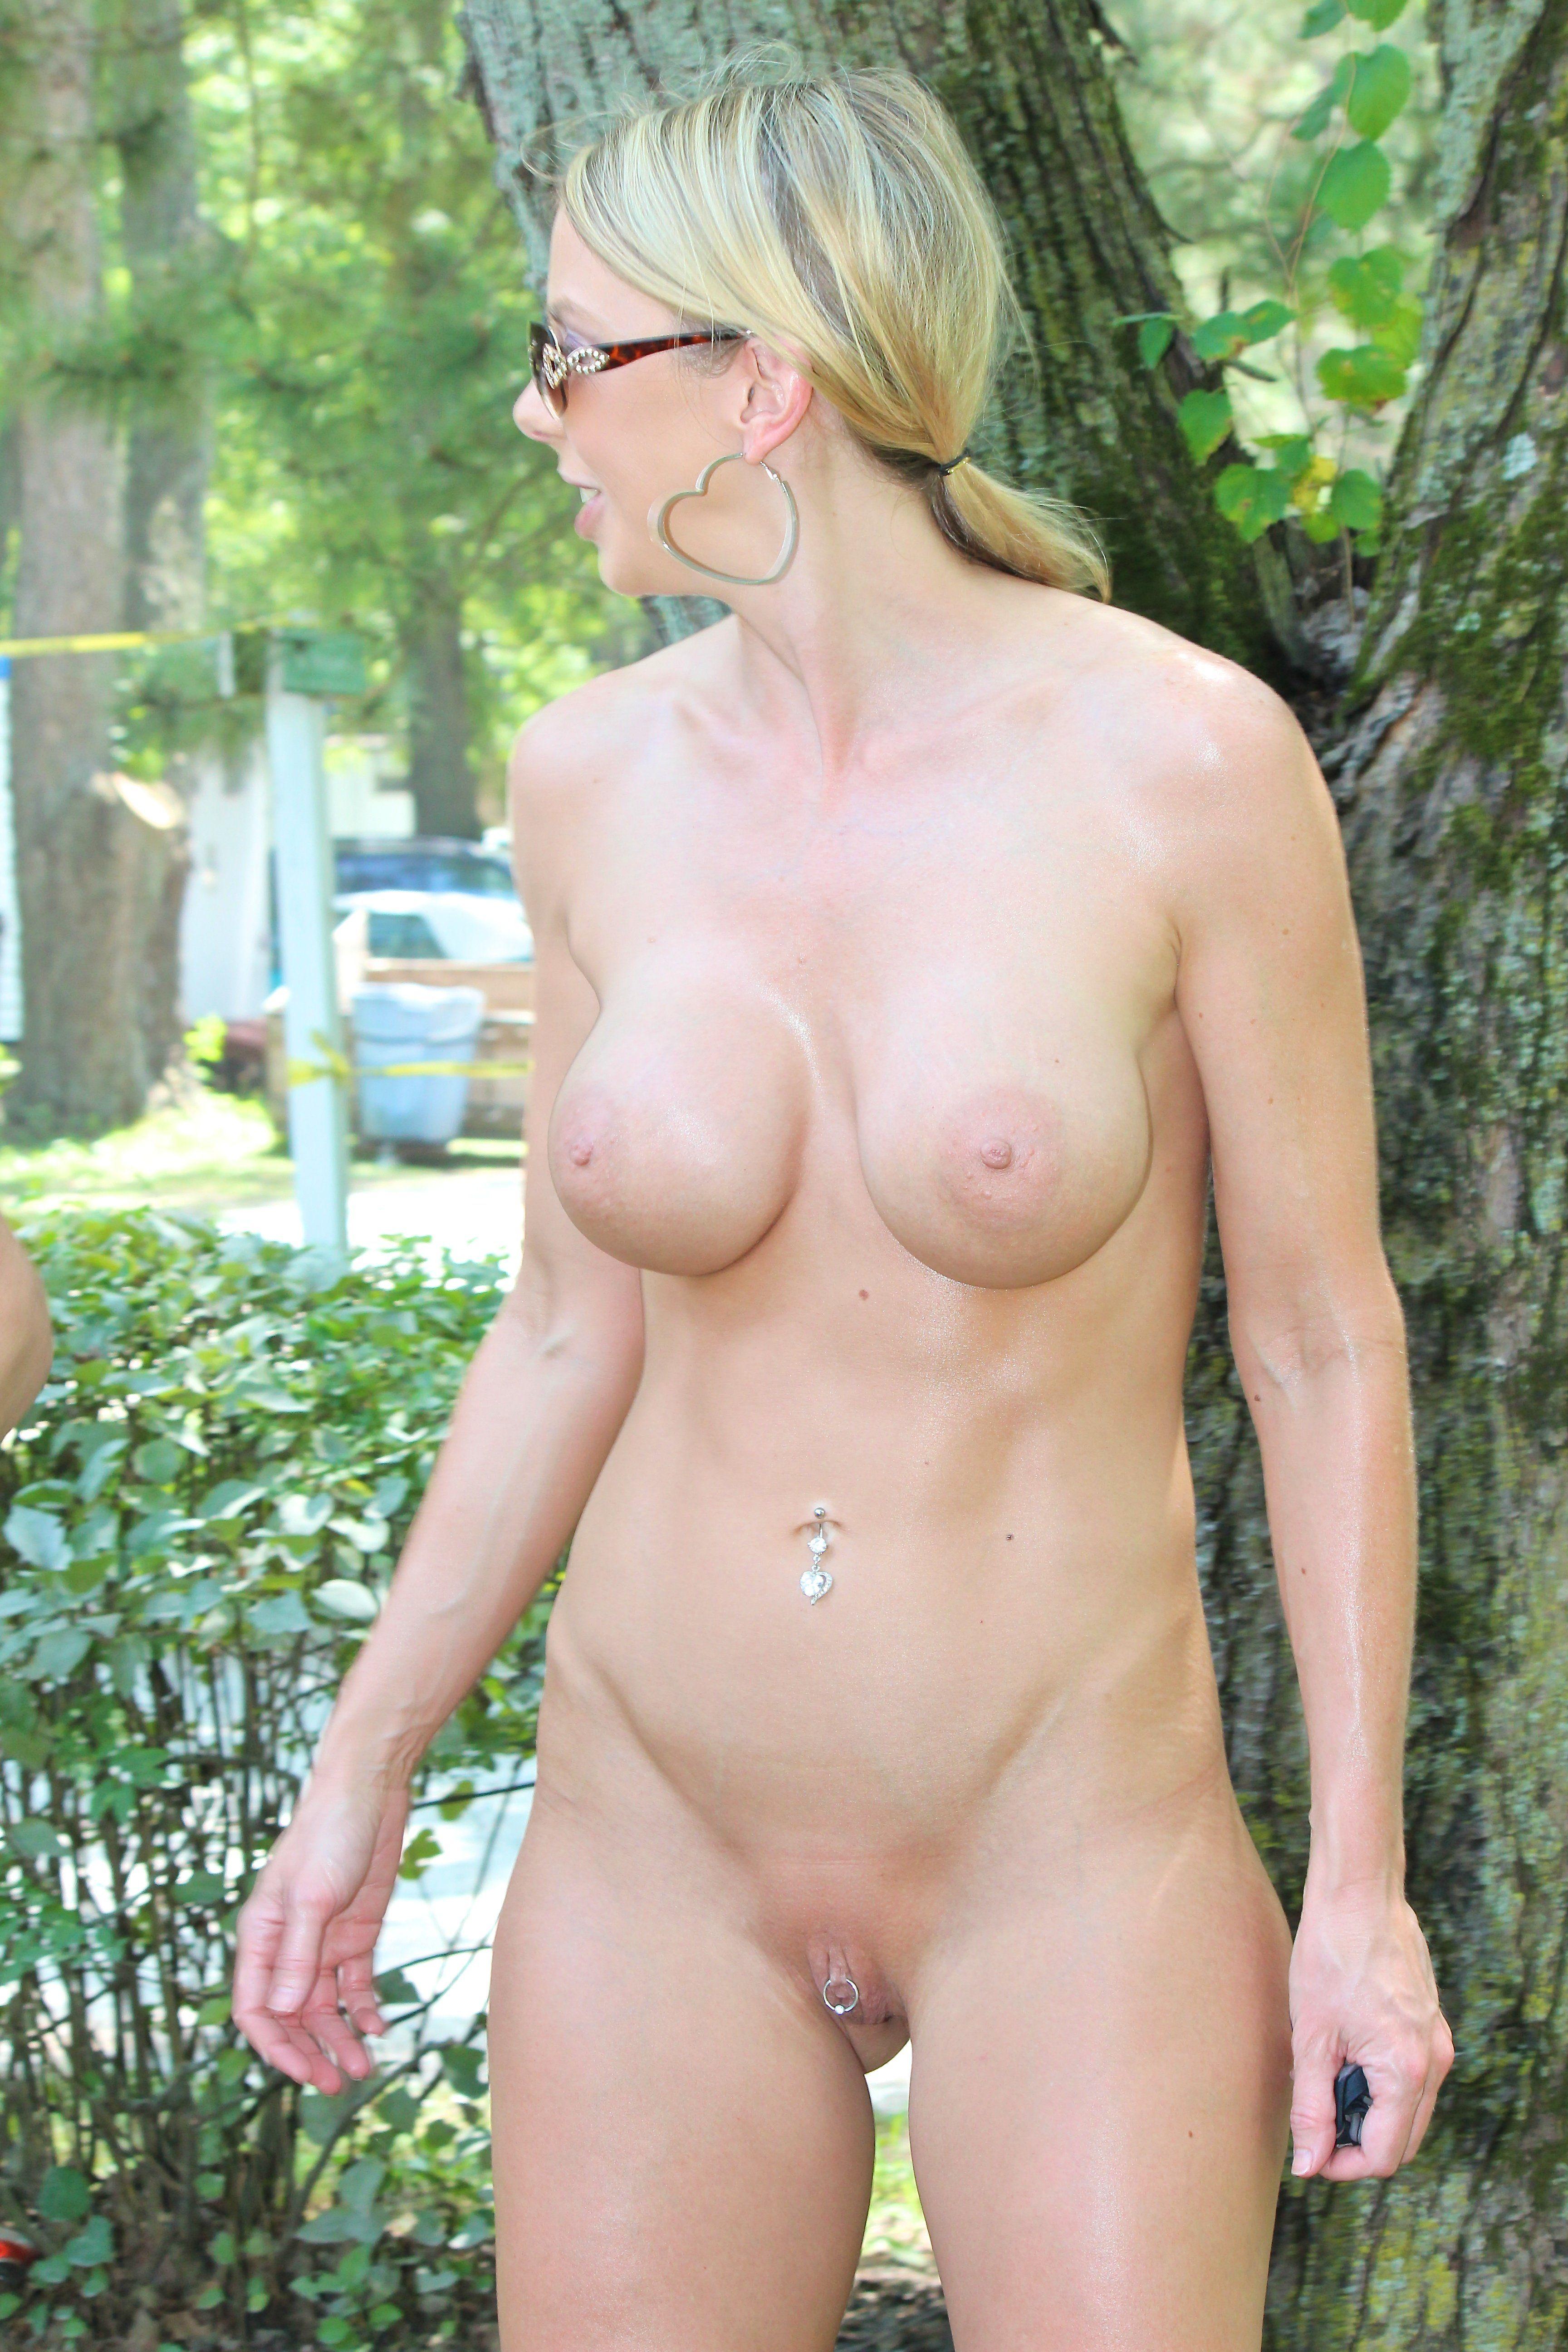 Nerdy busty nude girls